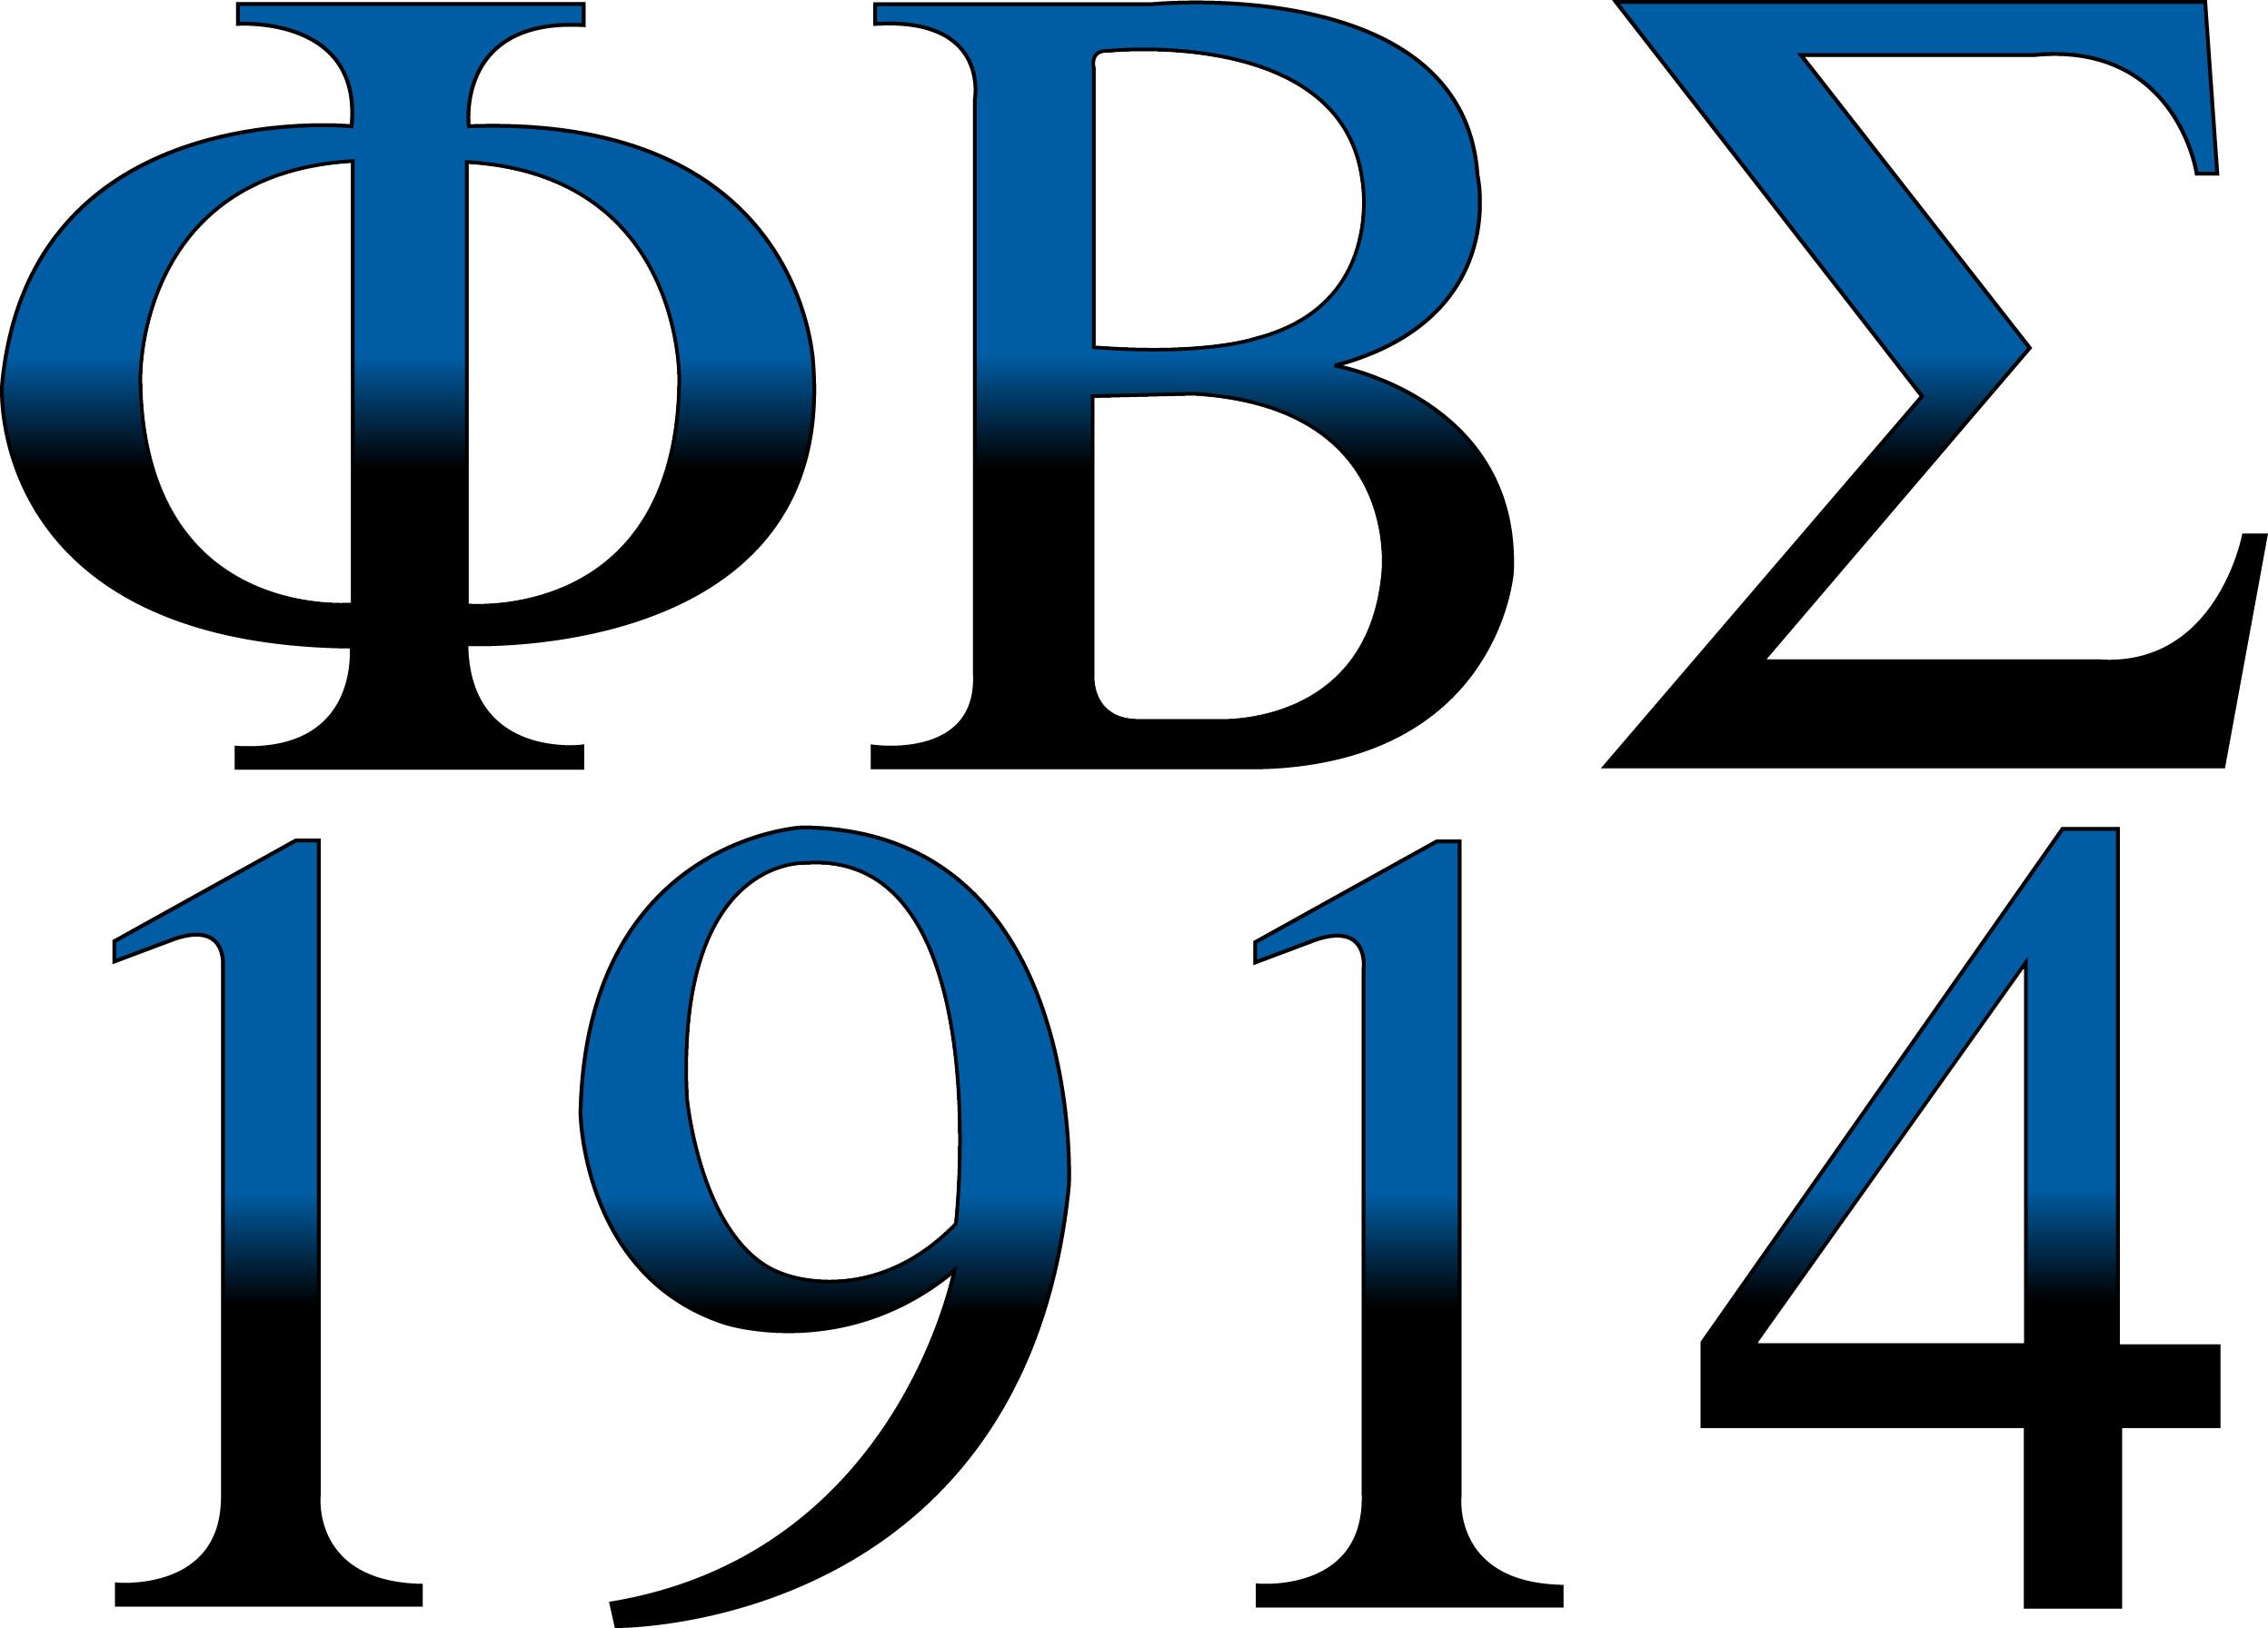 Zeta phi beta wallpaper 60 images 2496x1792 black unlimited phi beta sigma images buycottarizona